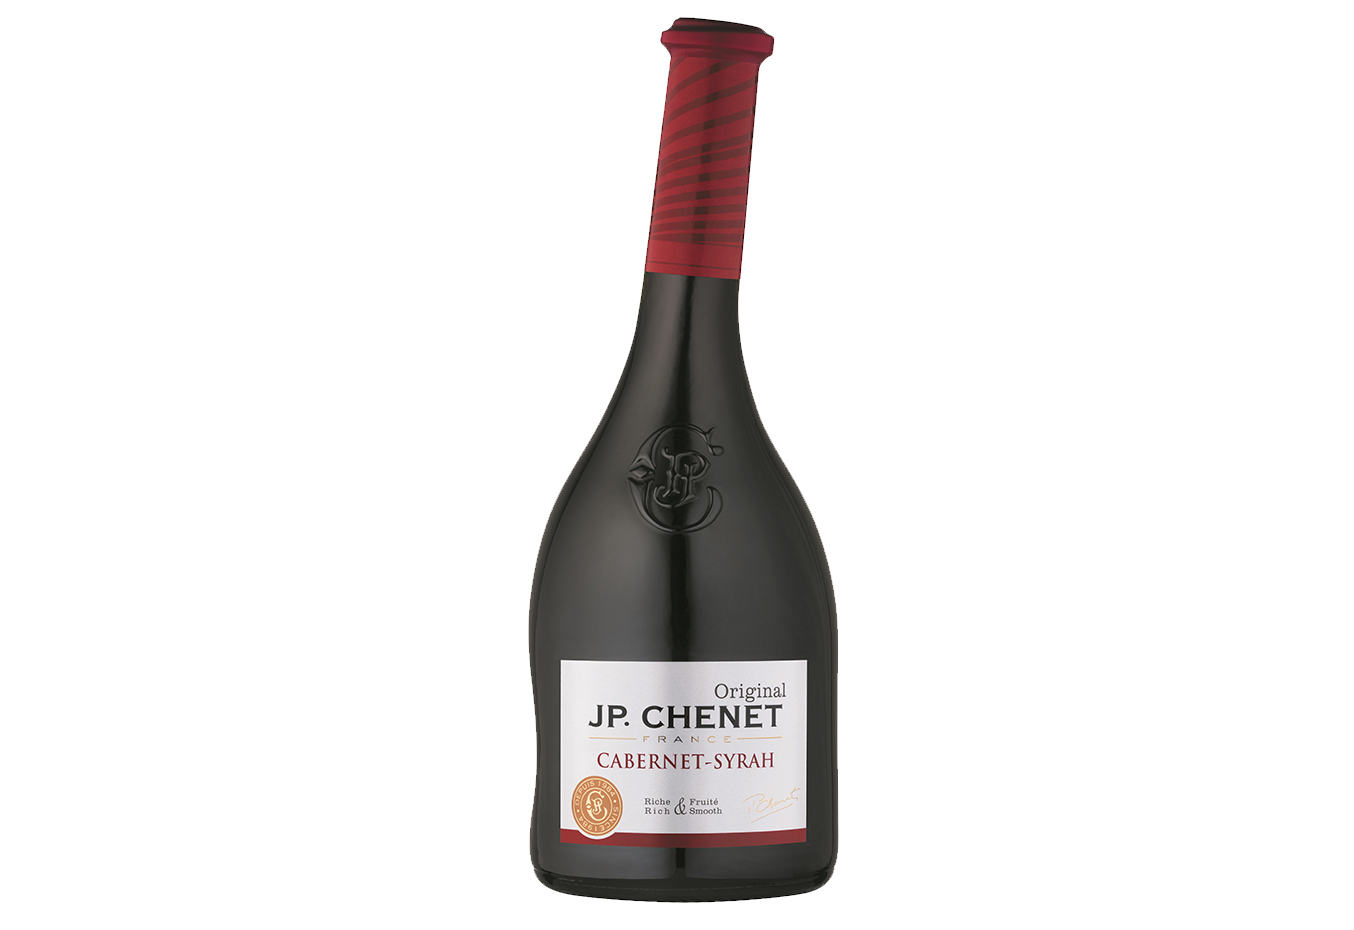 JP. Chenet